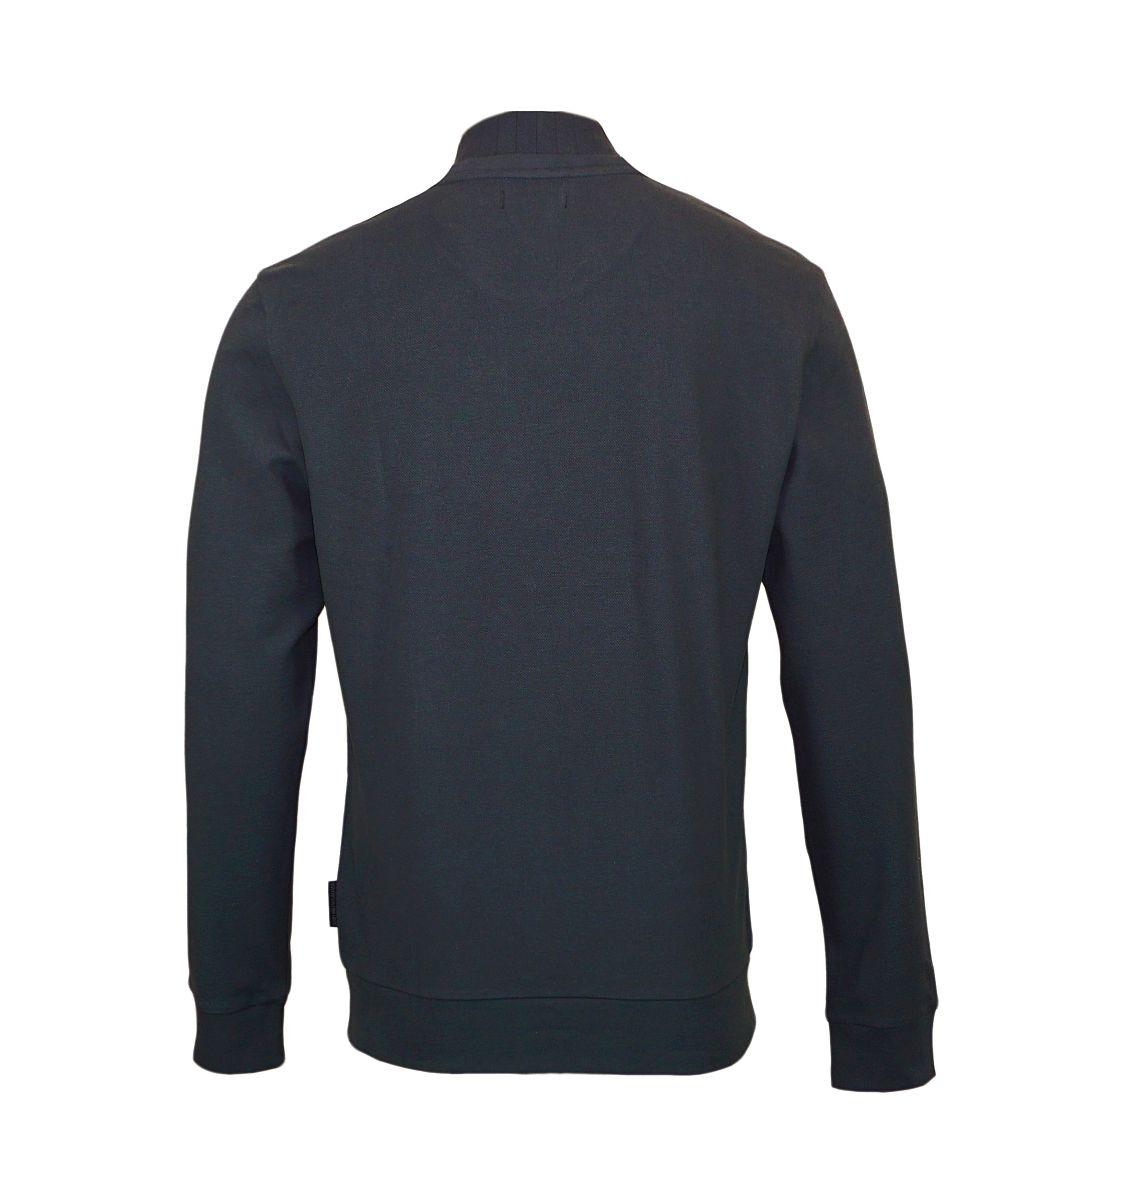 Emporio Armani Sweater Pullover Rundhals 111437 7A569 08444 FUMO HW17-EAS1